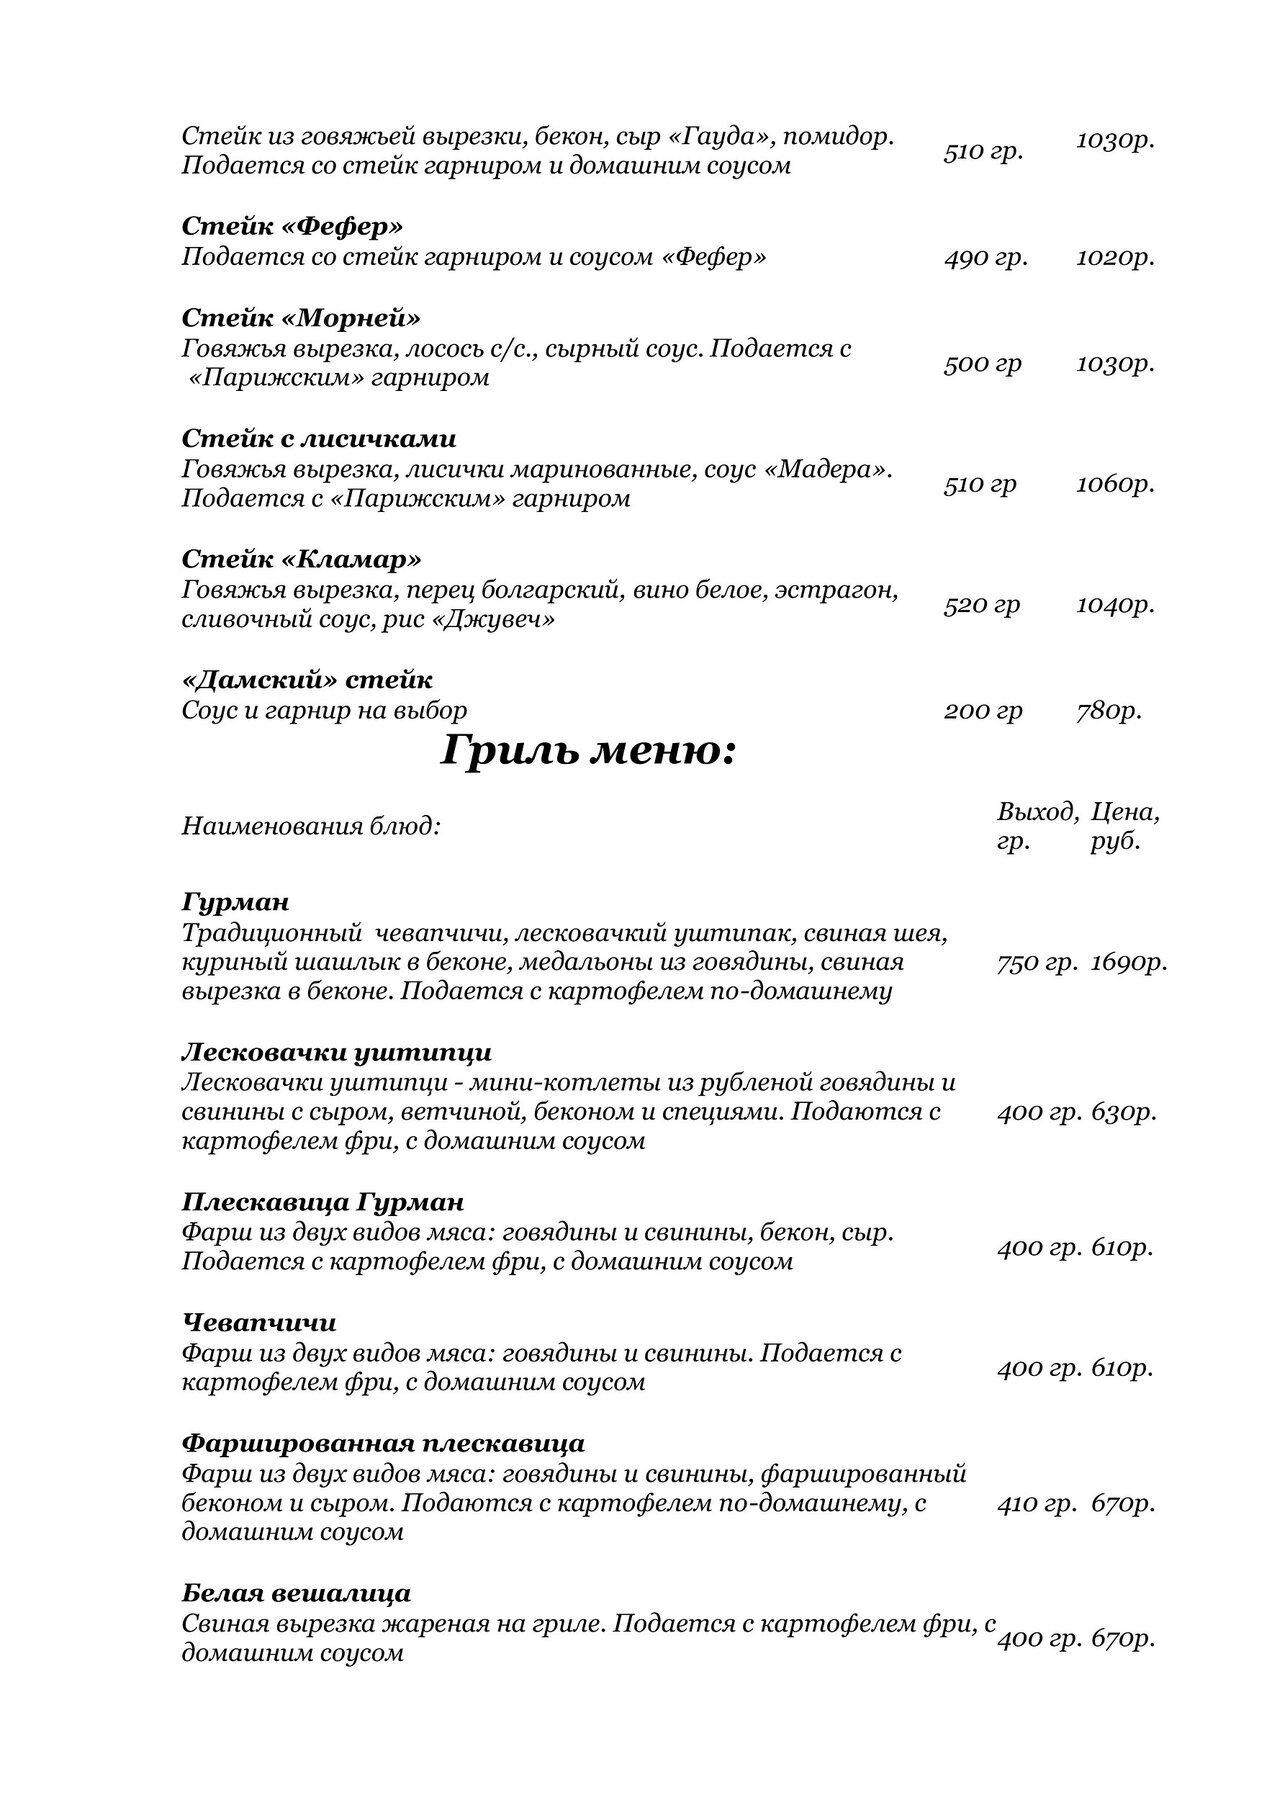 Меню ресторана Балканский Гурман на Декабристов фото 7